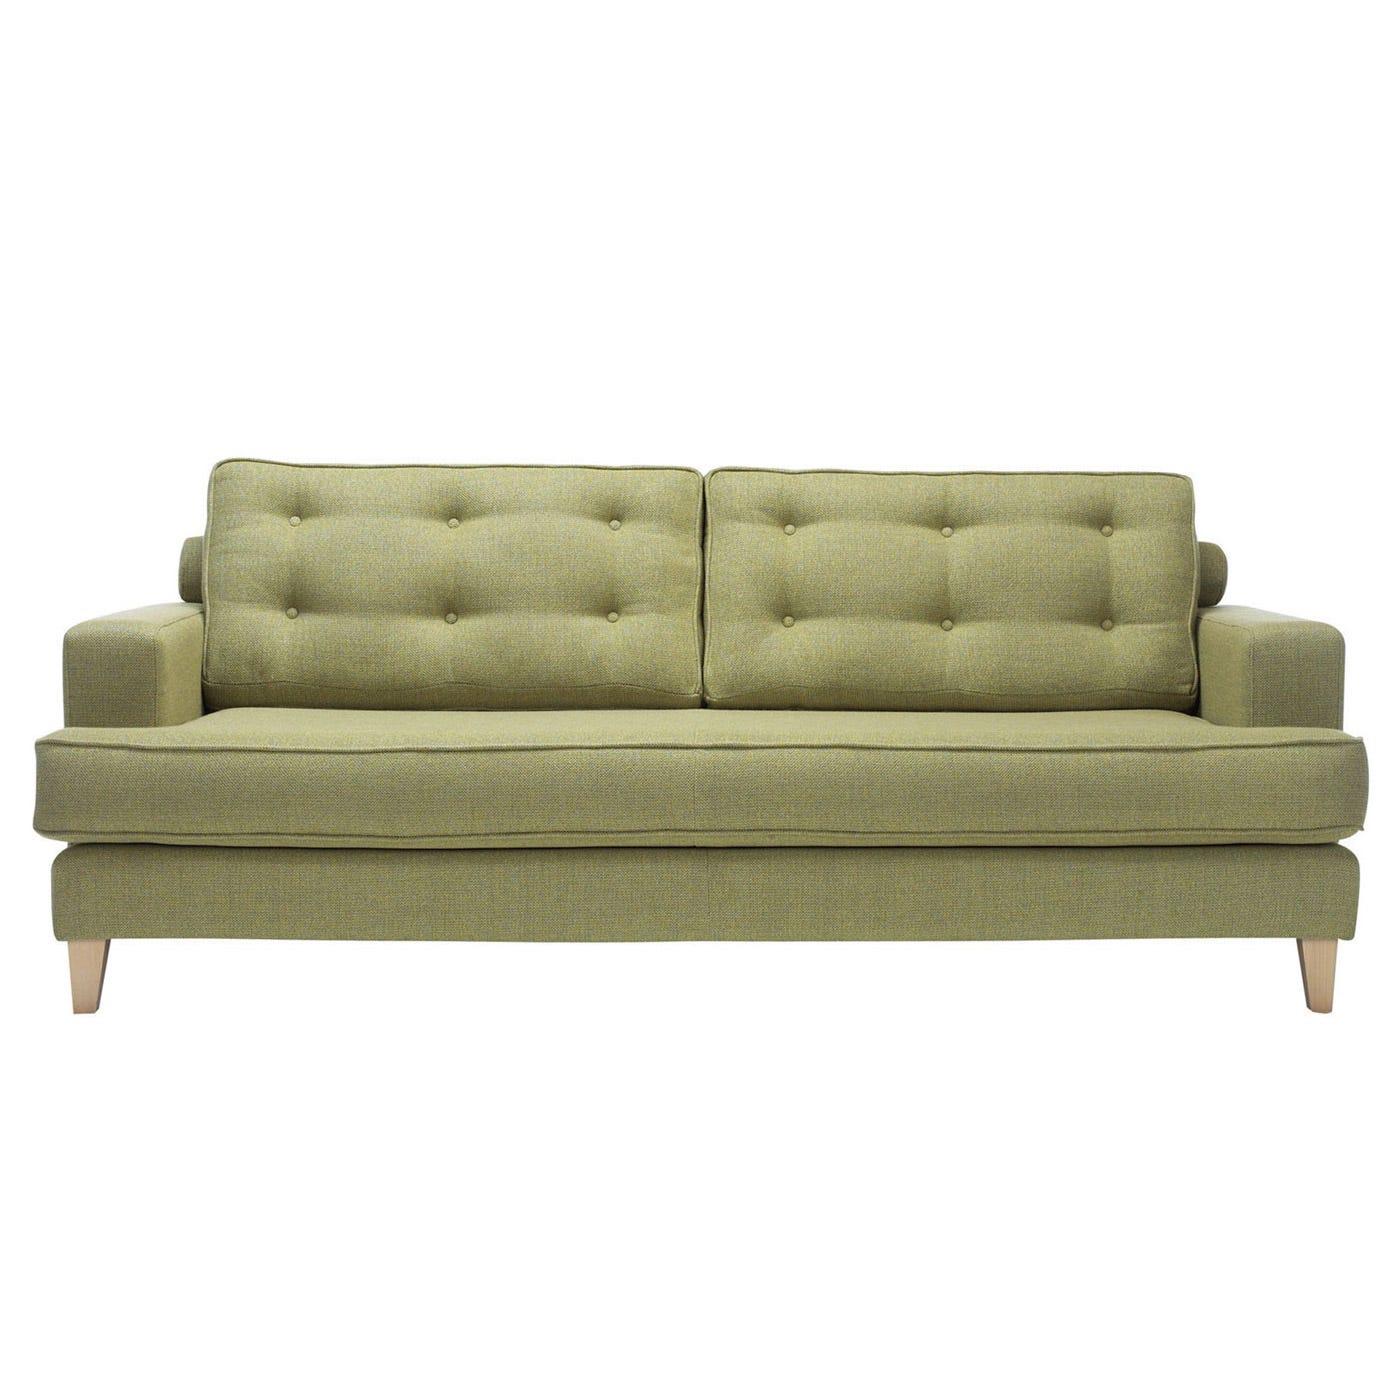 Mistral 4 Seater Sofa